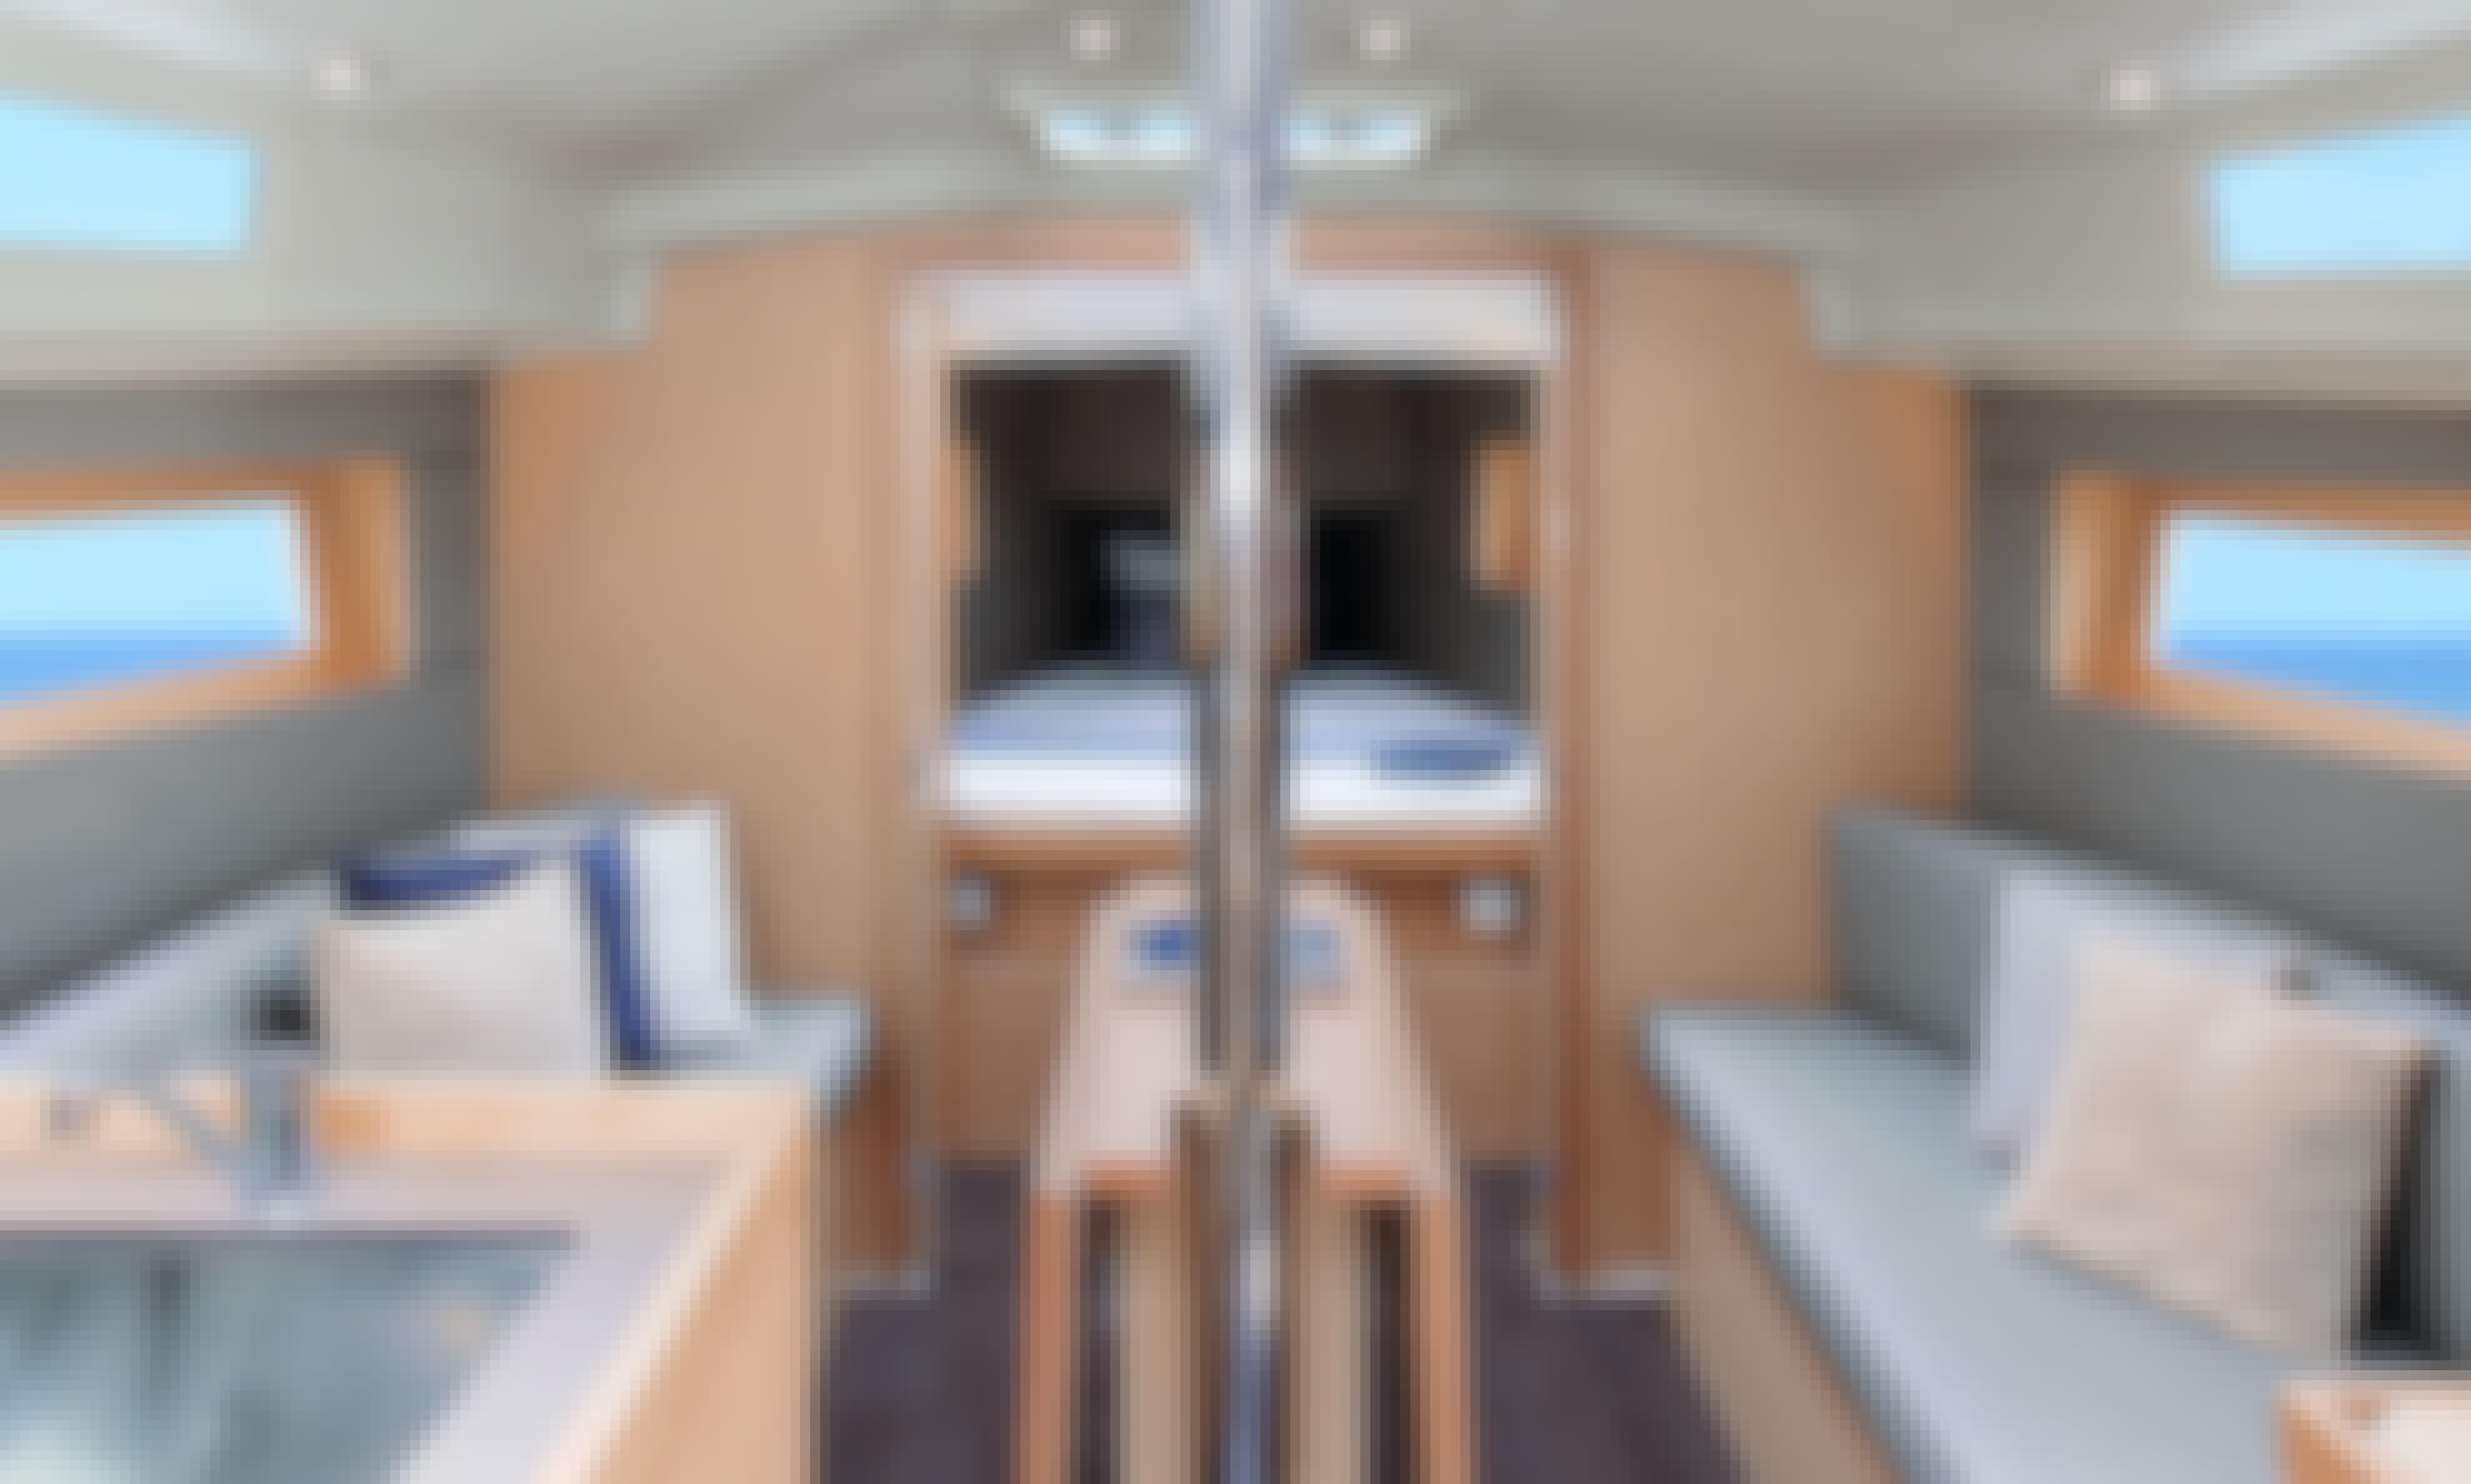 Enjoy the brand new Beneteau Oceanis 30.1 (2020) Sailboat in Barcelona, Spain!